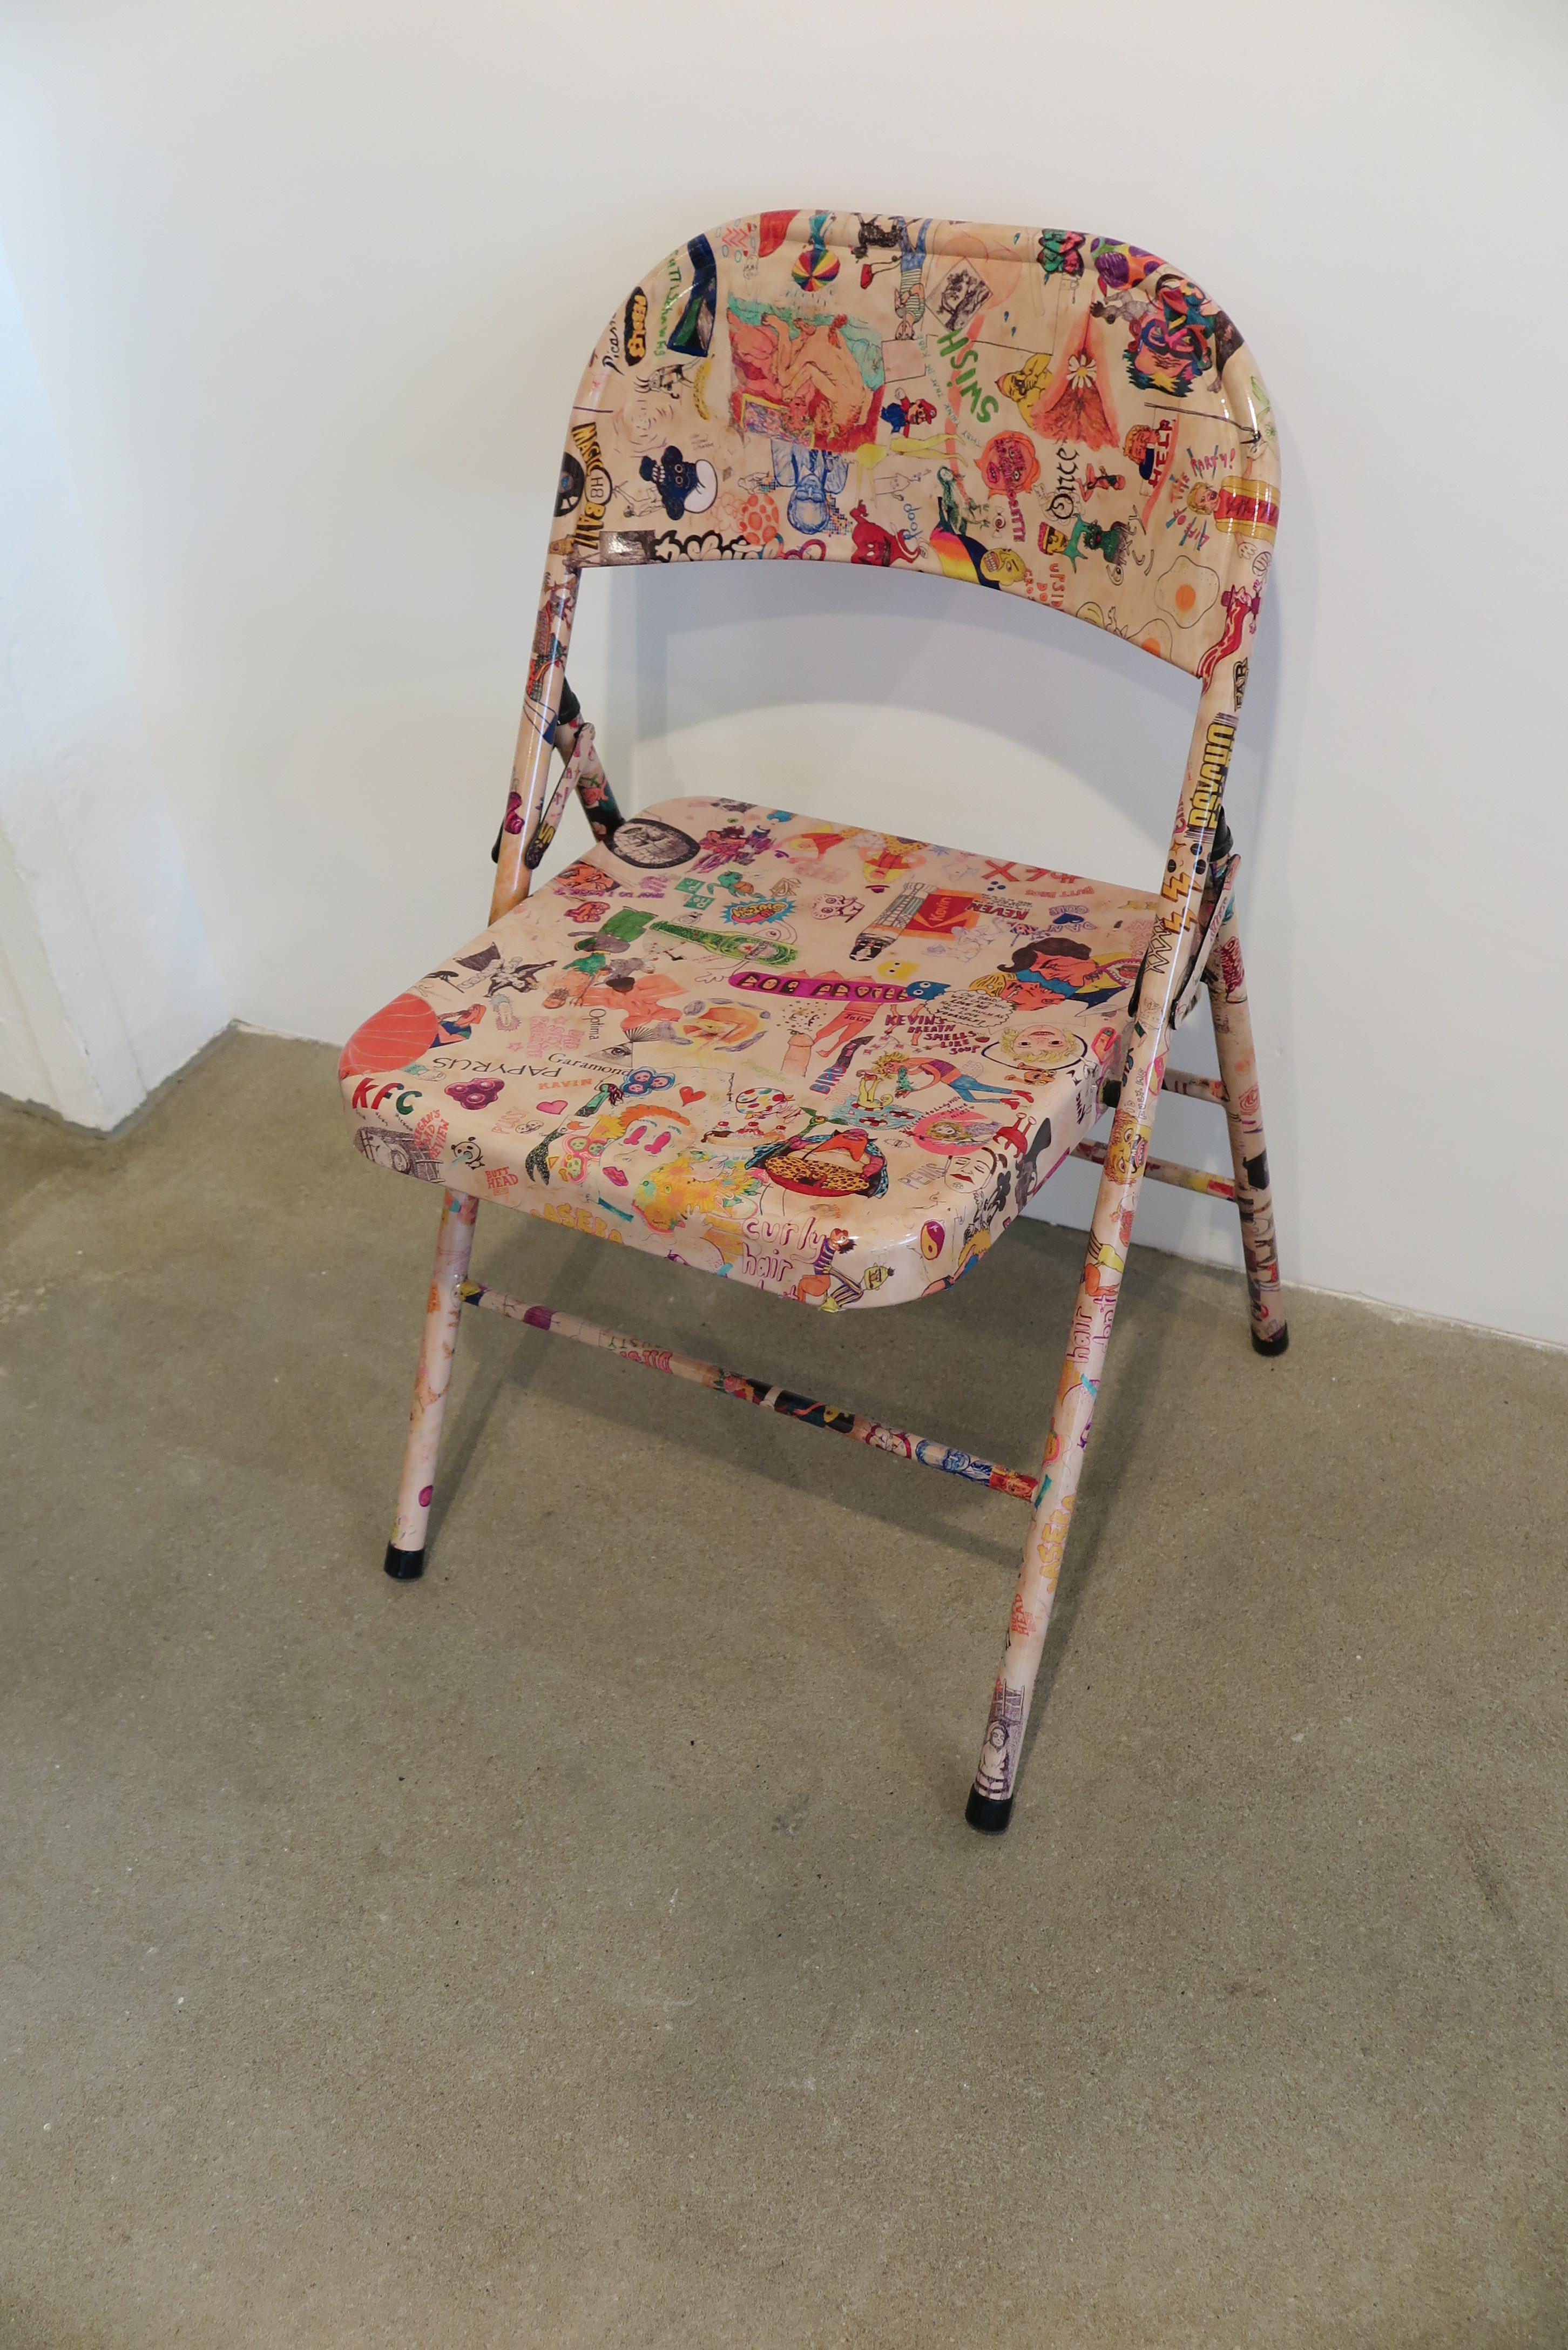 Rob Pruitt - Graffiti Chair